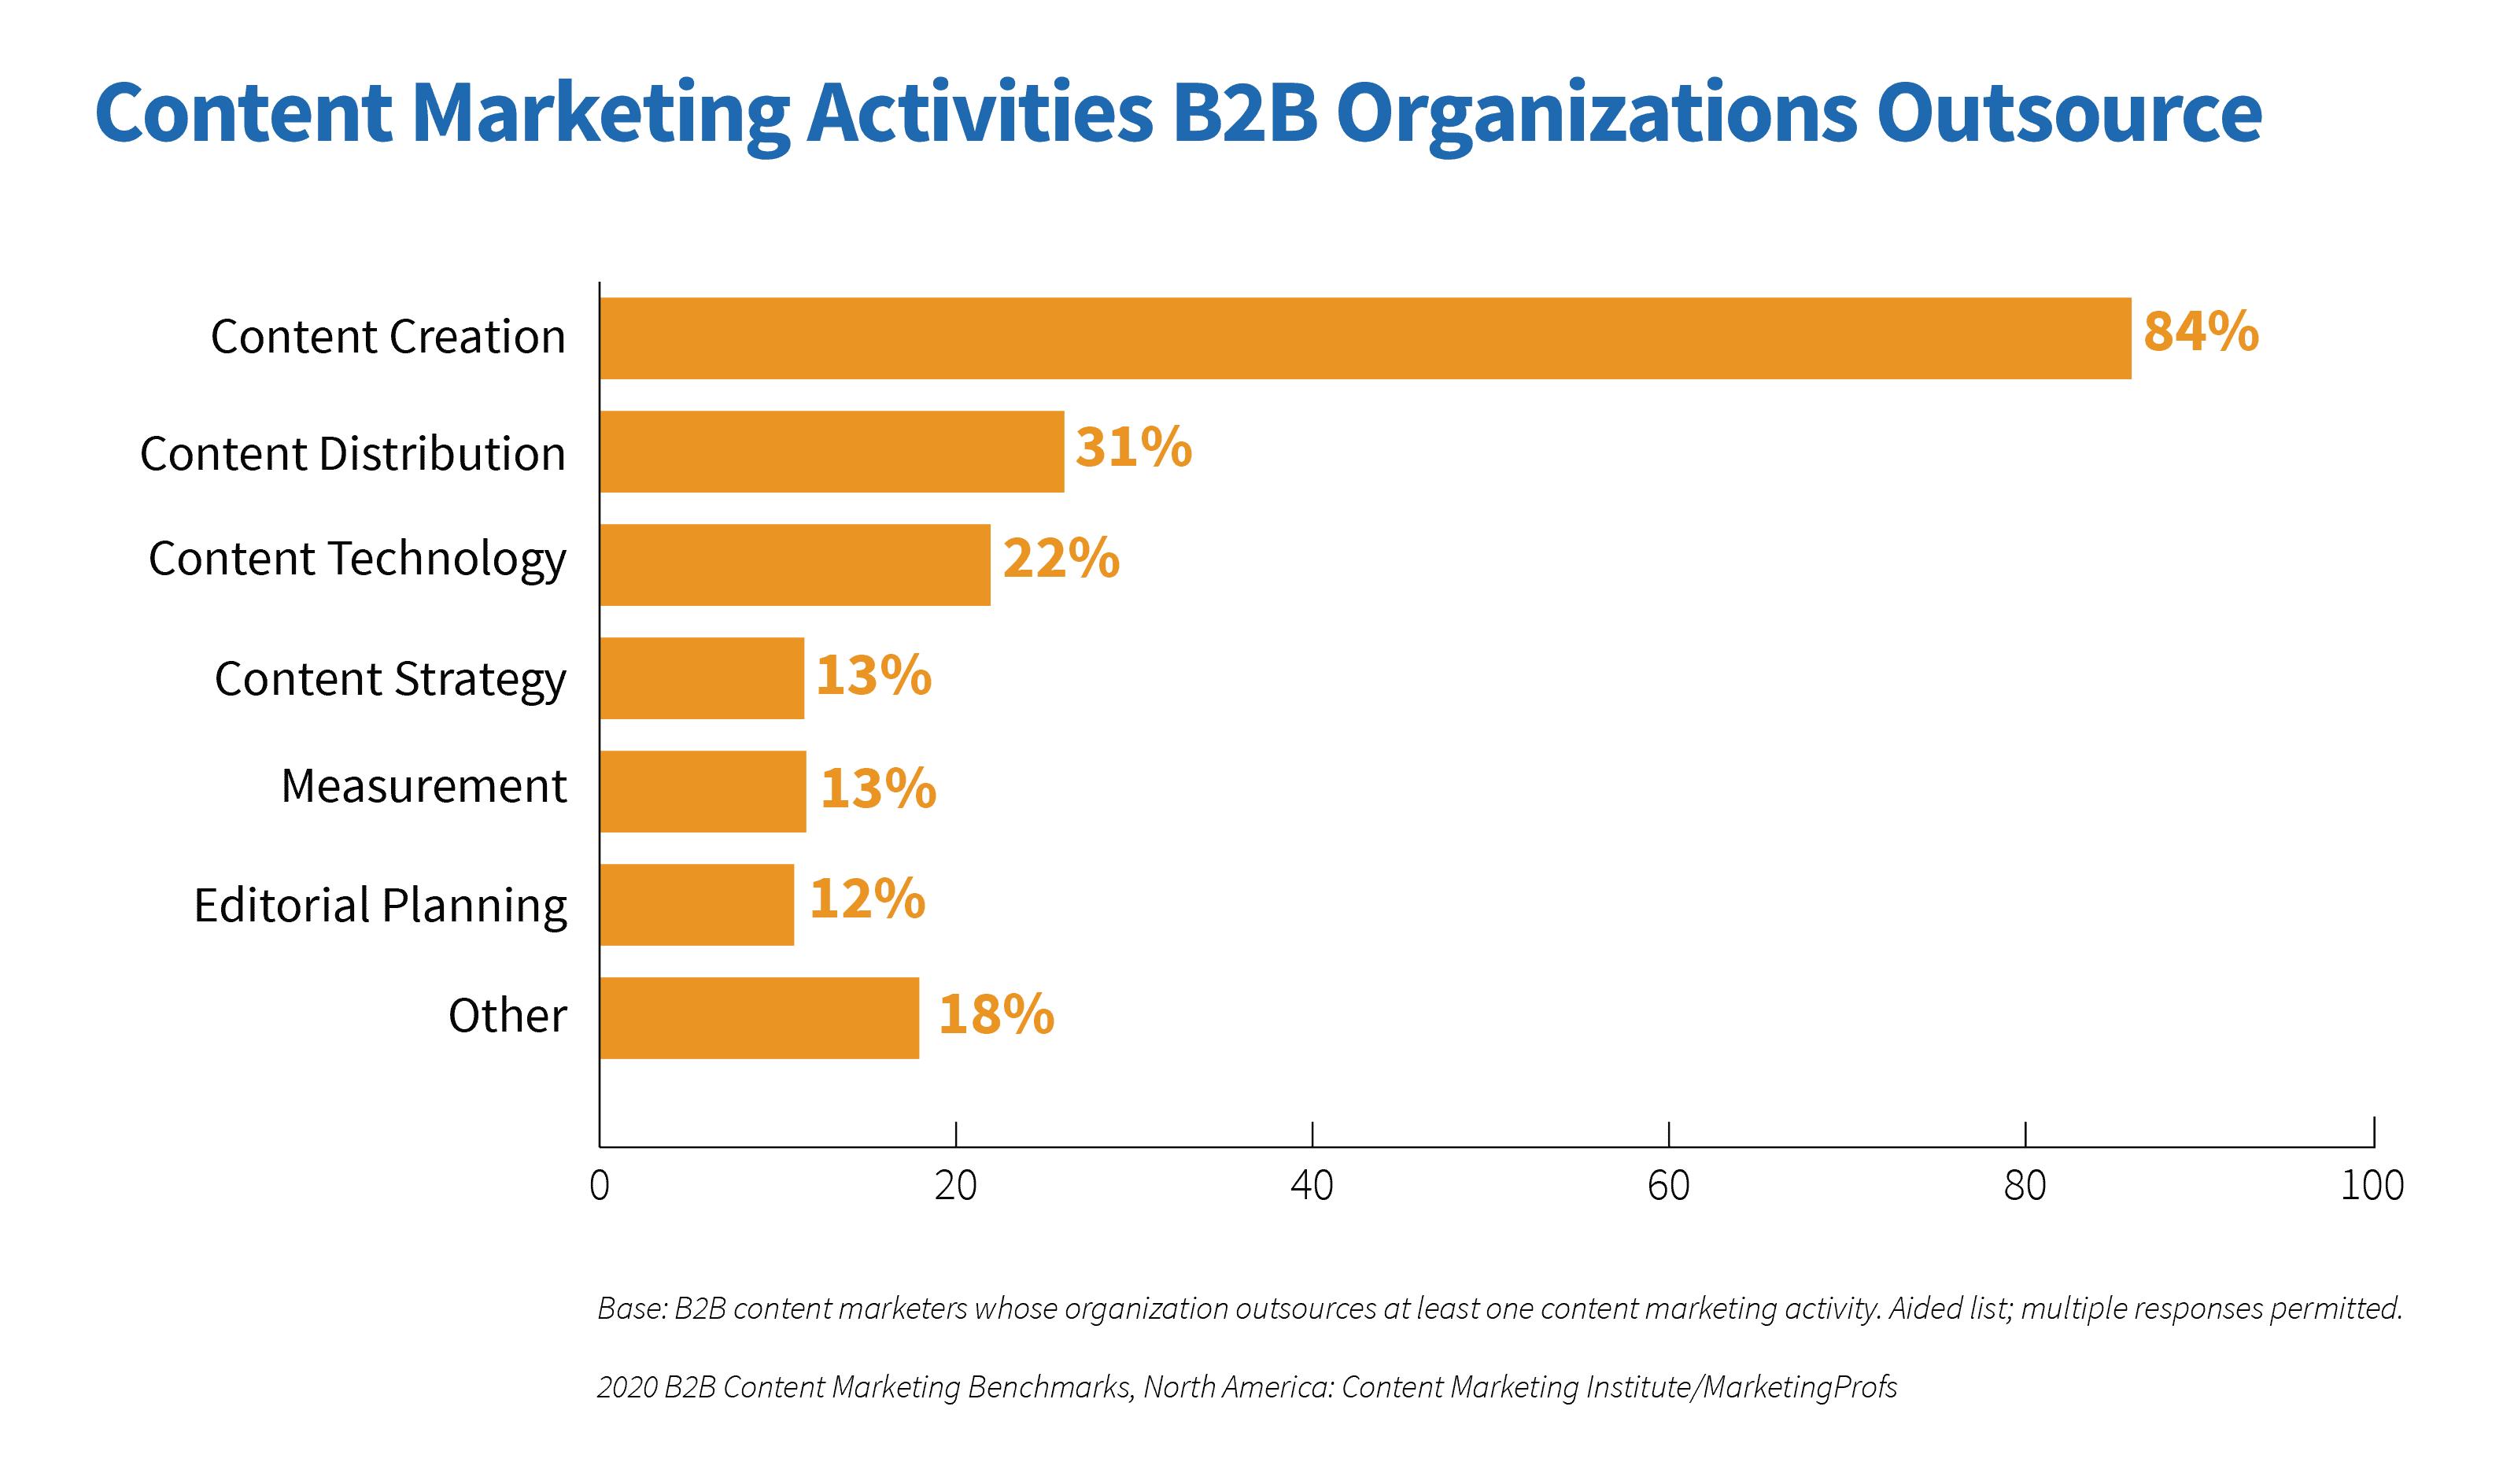 Content Marketing Activities B2B Organizations Outsource